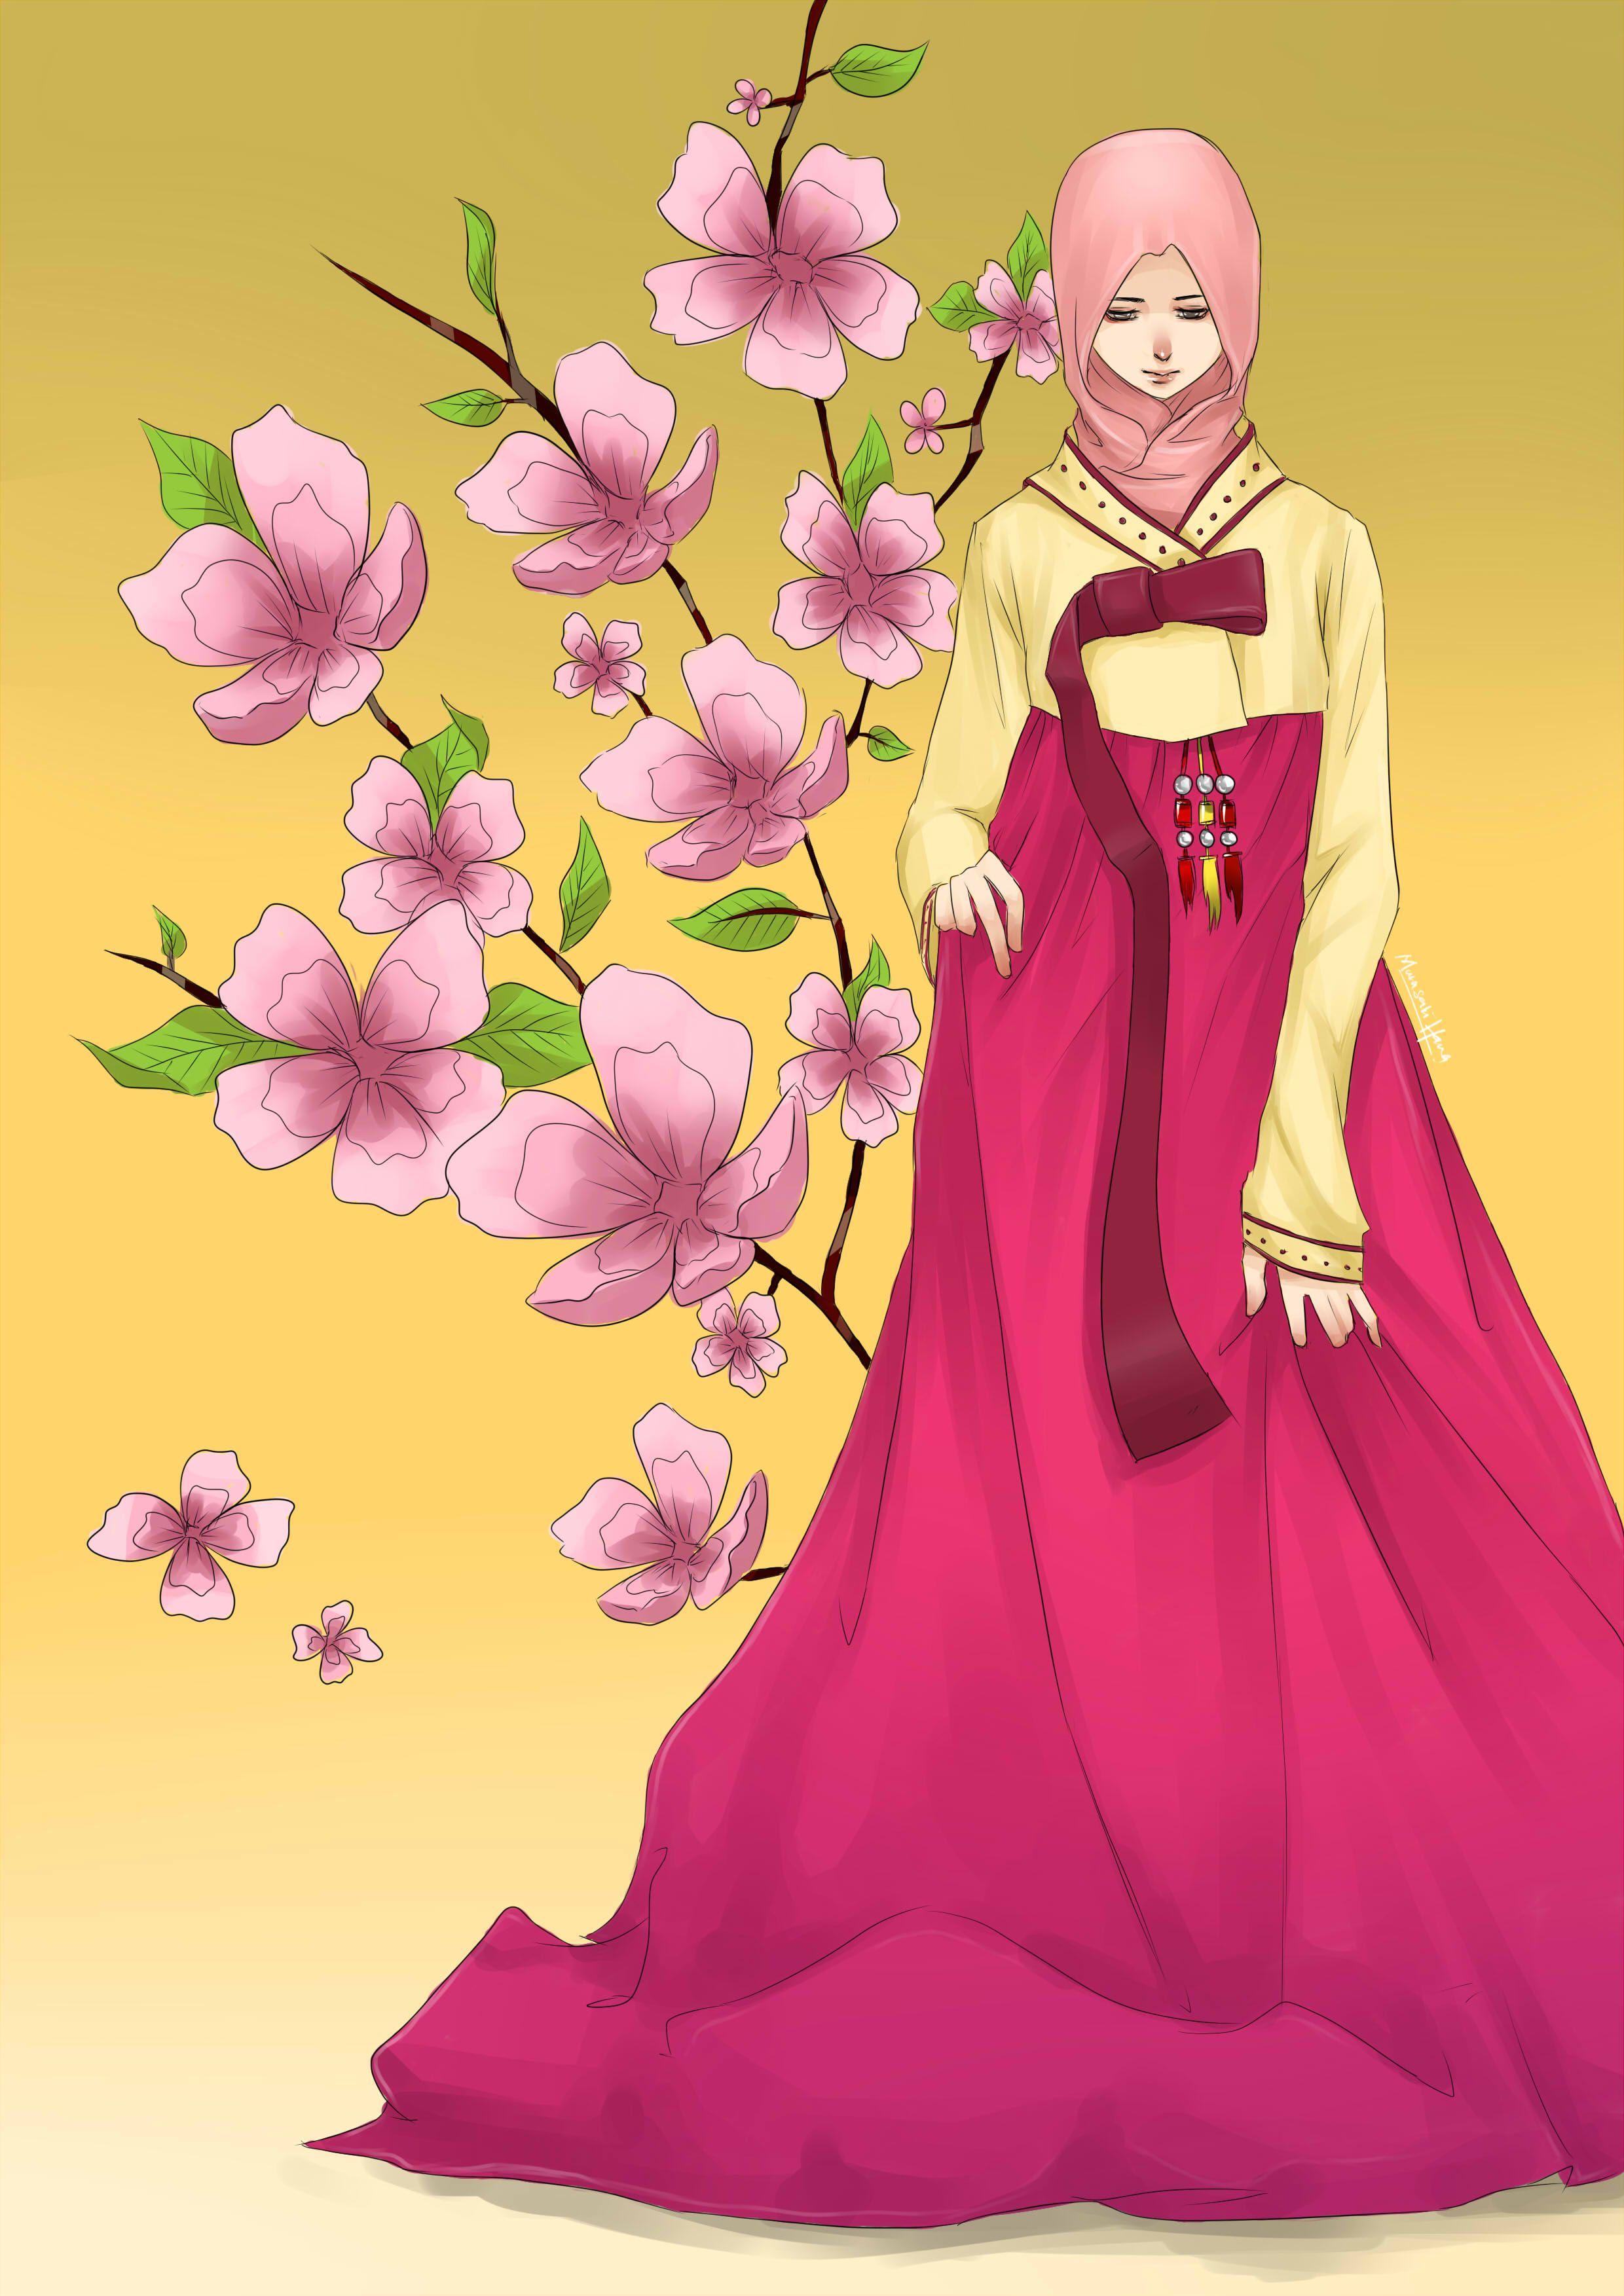 Pin By Miru Kitsune On Artists That Inspire Anime Muslimah Anime